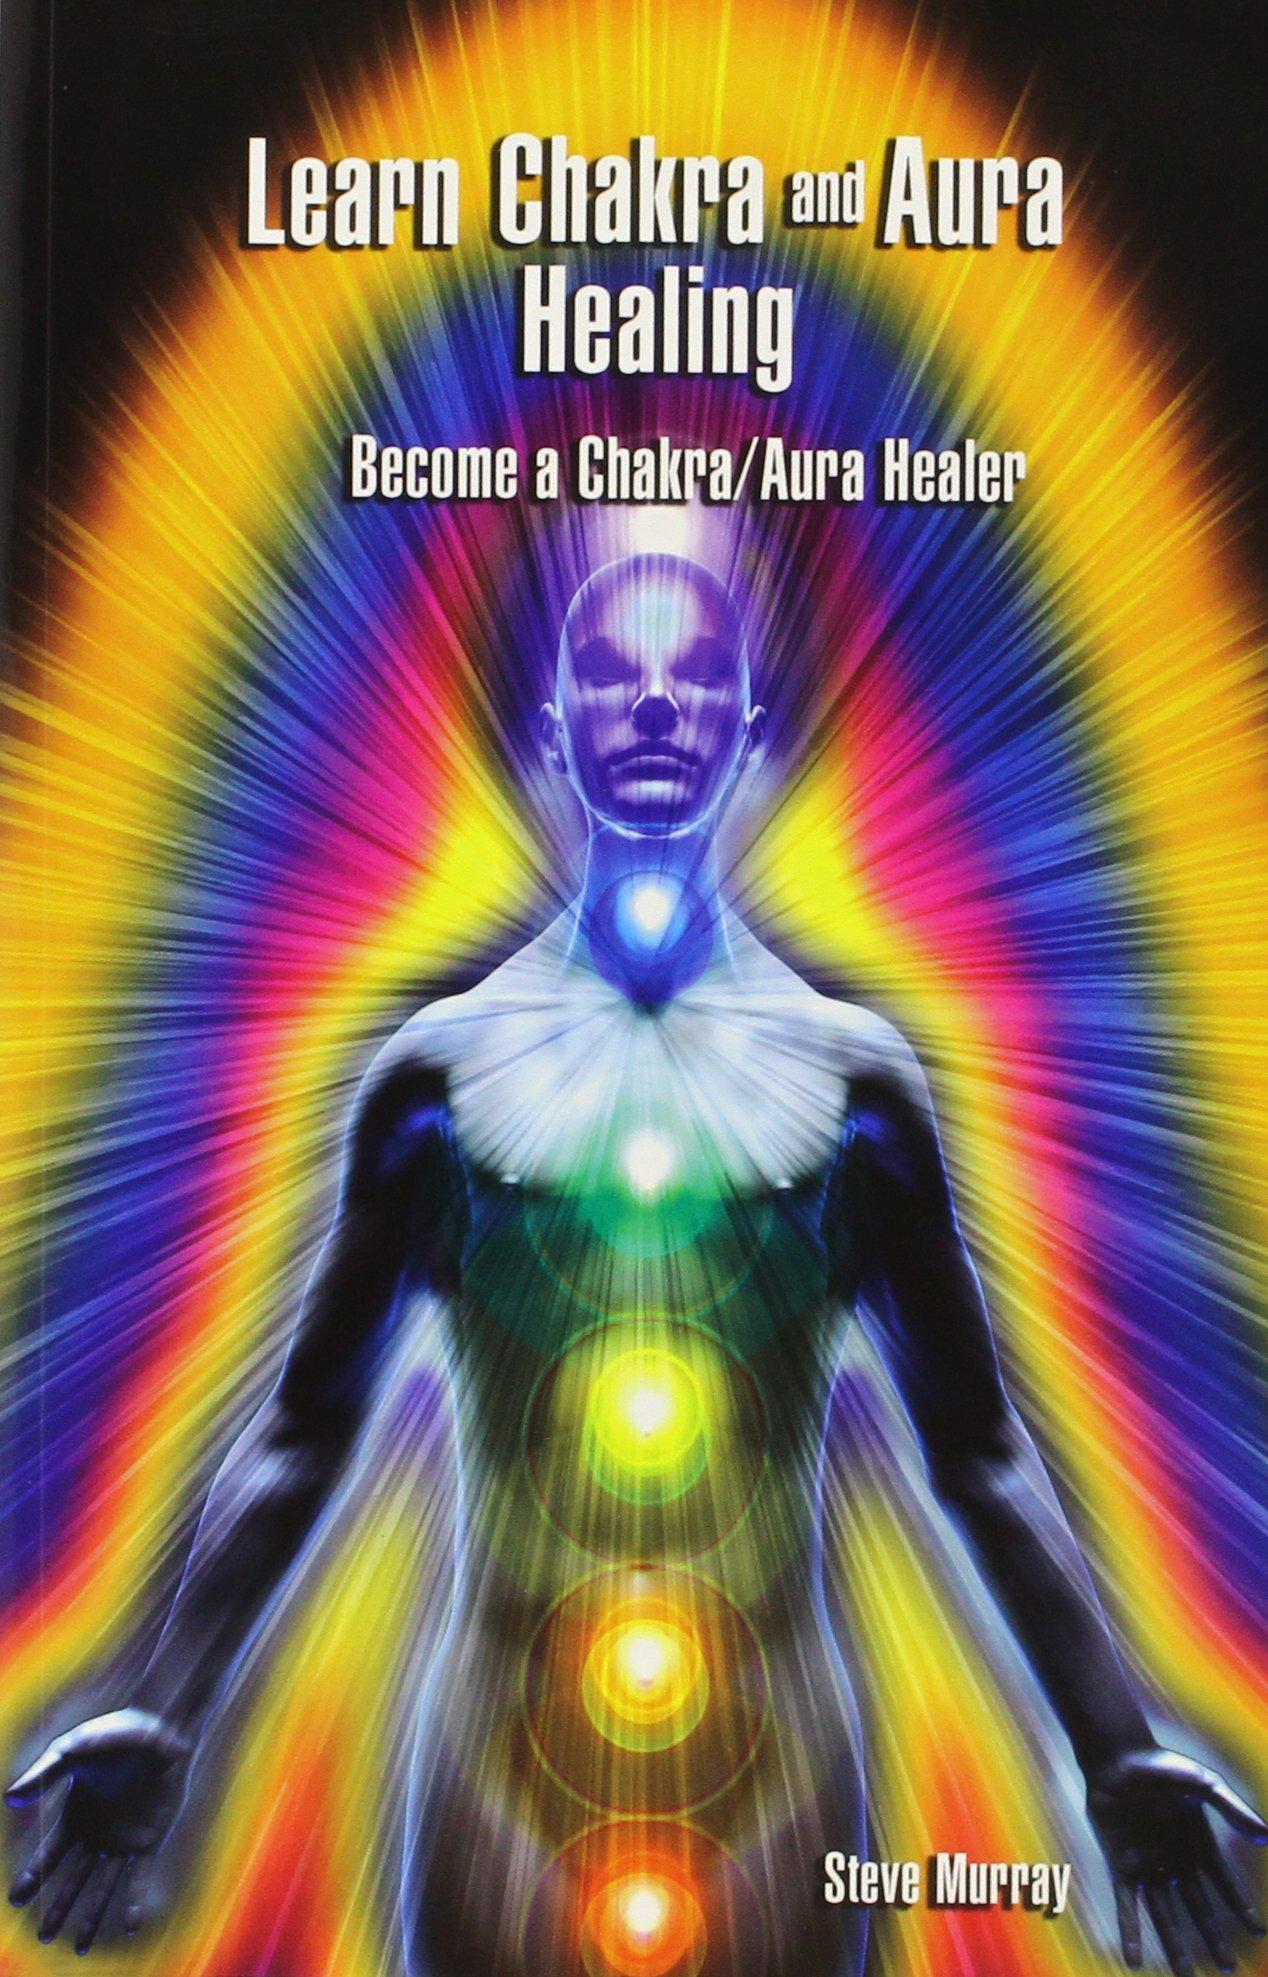 Download Chakra & Aura Healer Certification Program: Be a Chakra & Aura Healer pdf epub